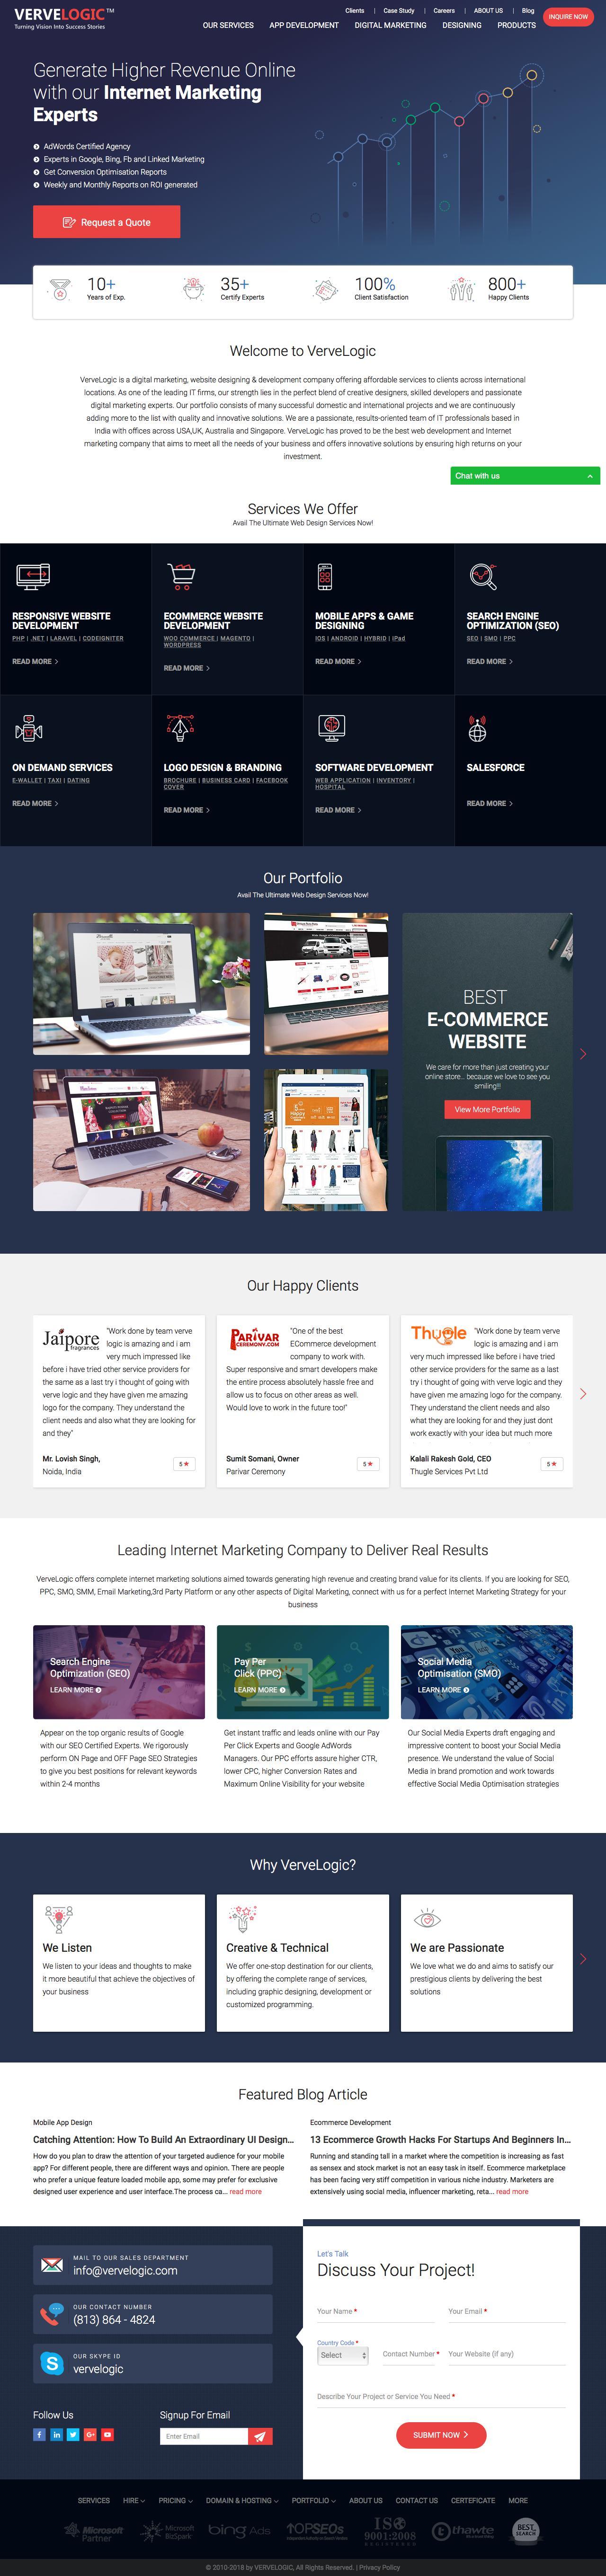 Screenshot of vervelogic.com - Web Design India and Internet marketing company India, jaipur - captured June 9, 2018